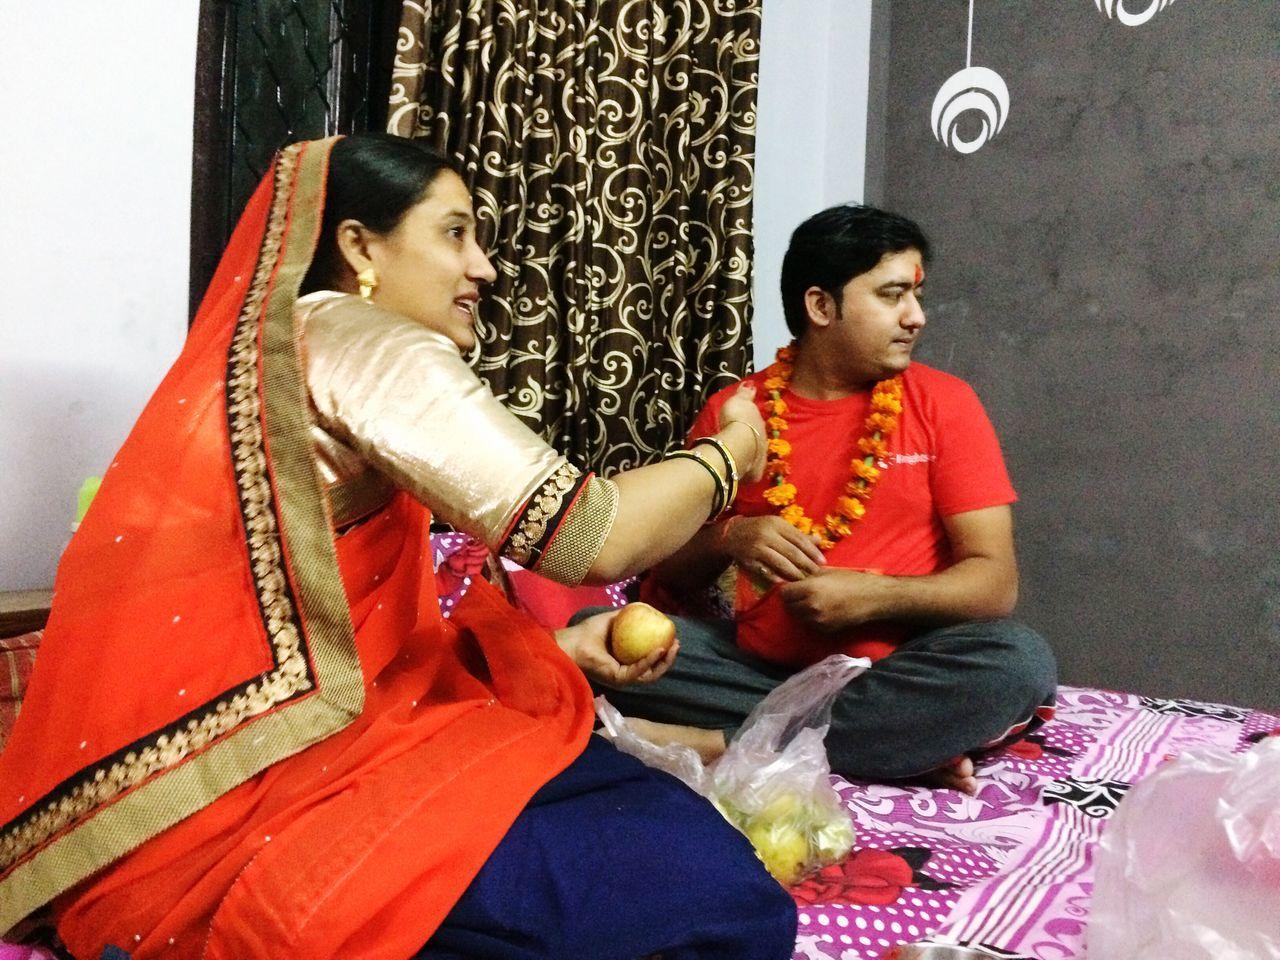 Indian Brother Sister Celebrating Bhaiya Dooj Festival (Tikka)